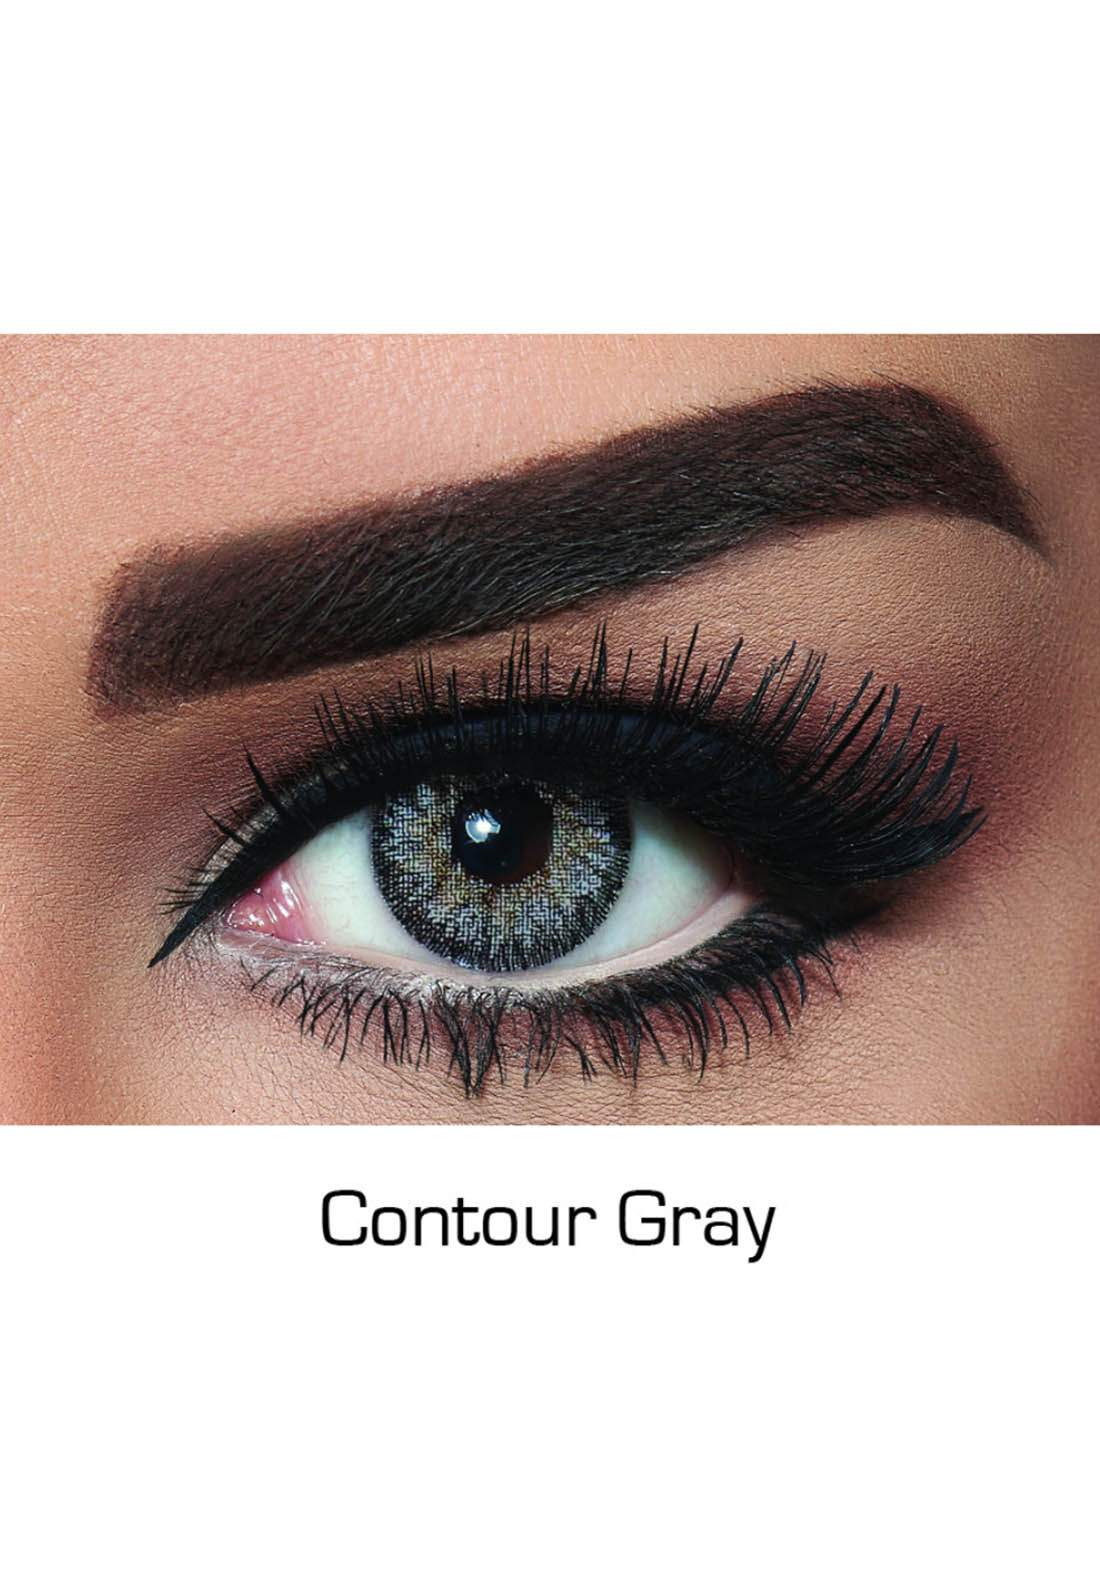 Bella Classic 301004 Contact Lenses 3 Months Use Contour - Gray  No. 4 عدسات لاصقة